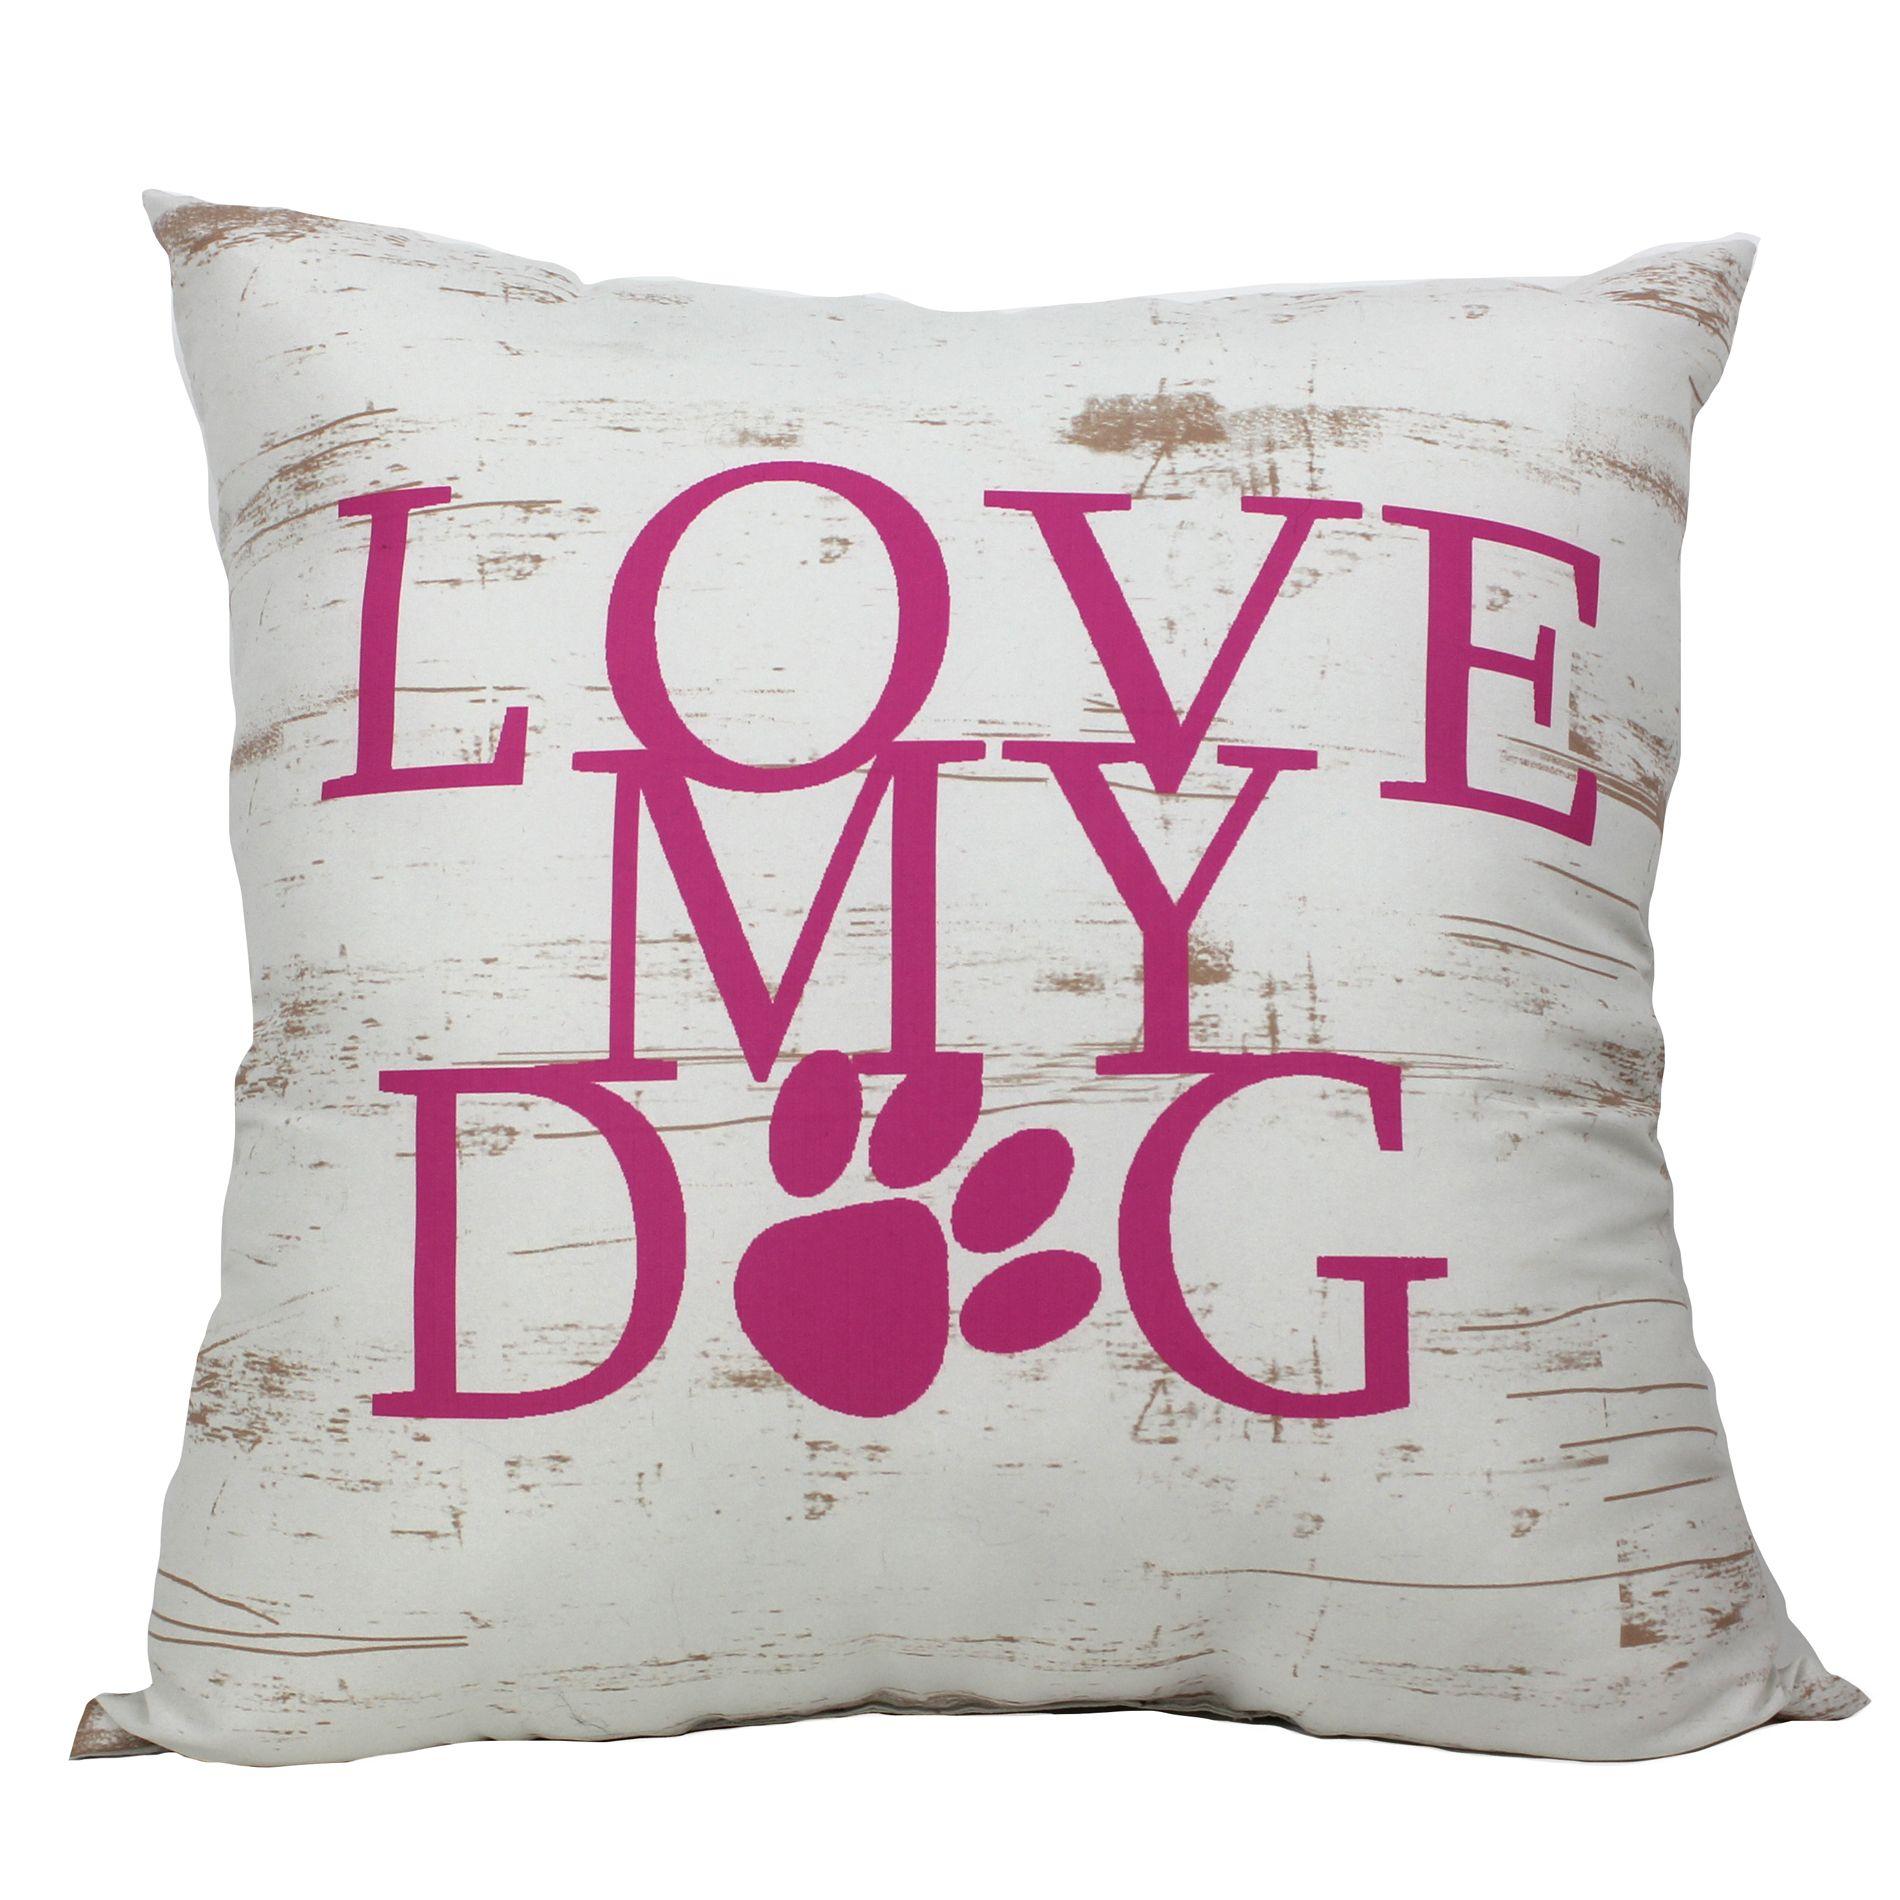 TAC Home Love My Dog Pillow, Multi Kmart decor, Pillows